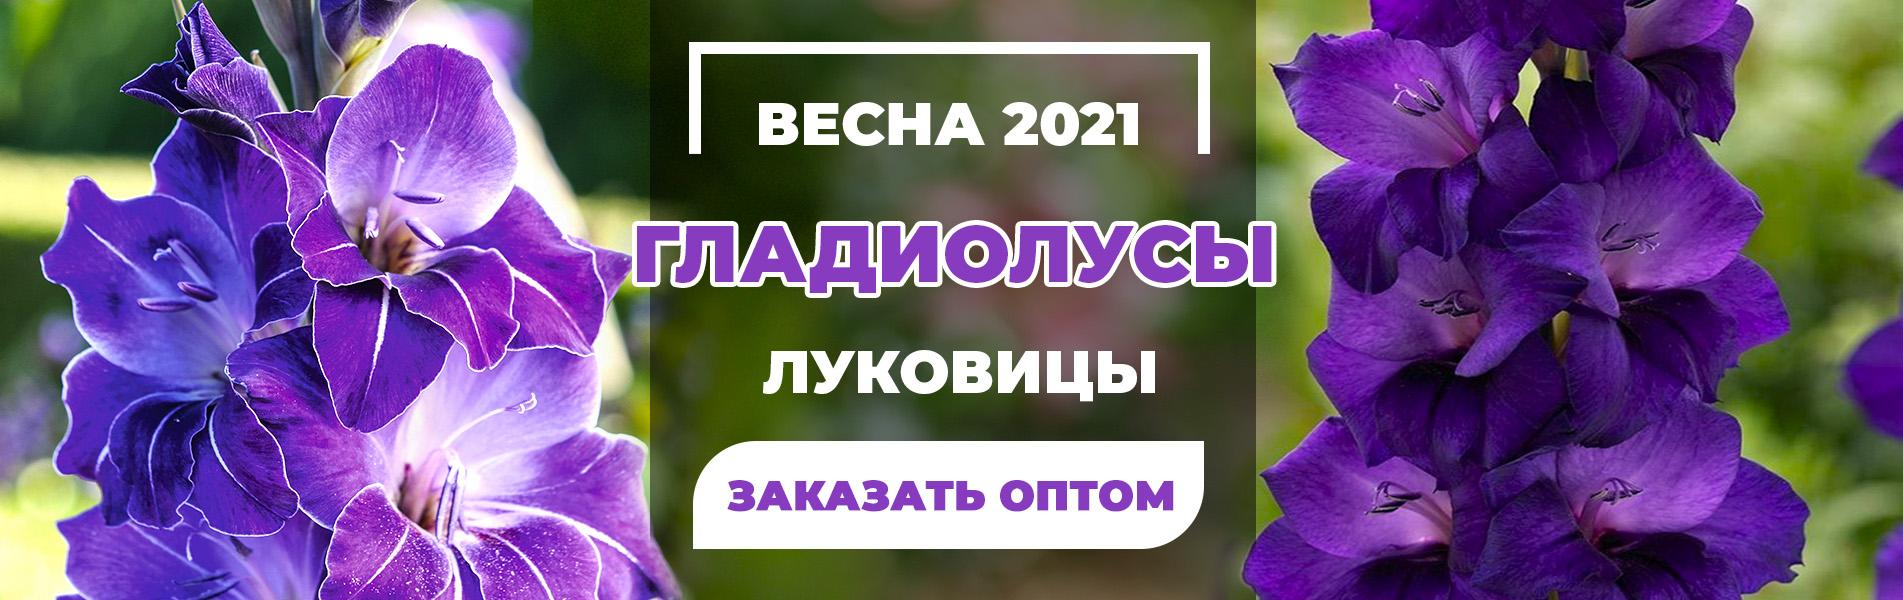 Весна 2021 Гладиолусы